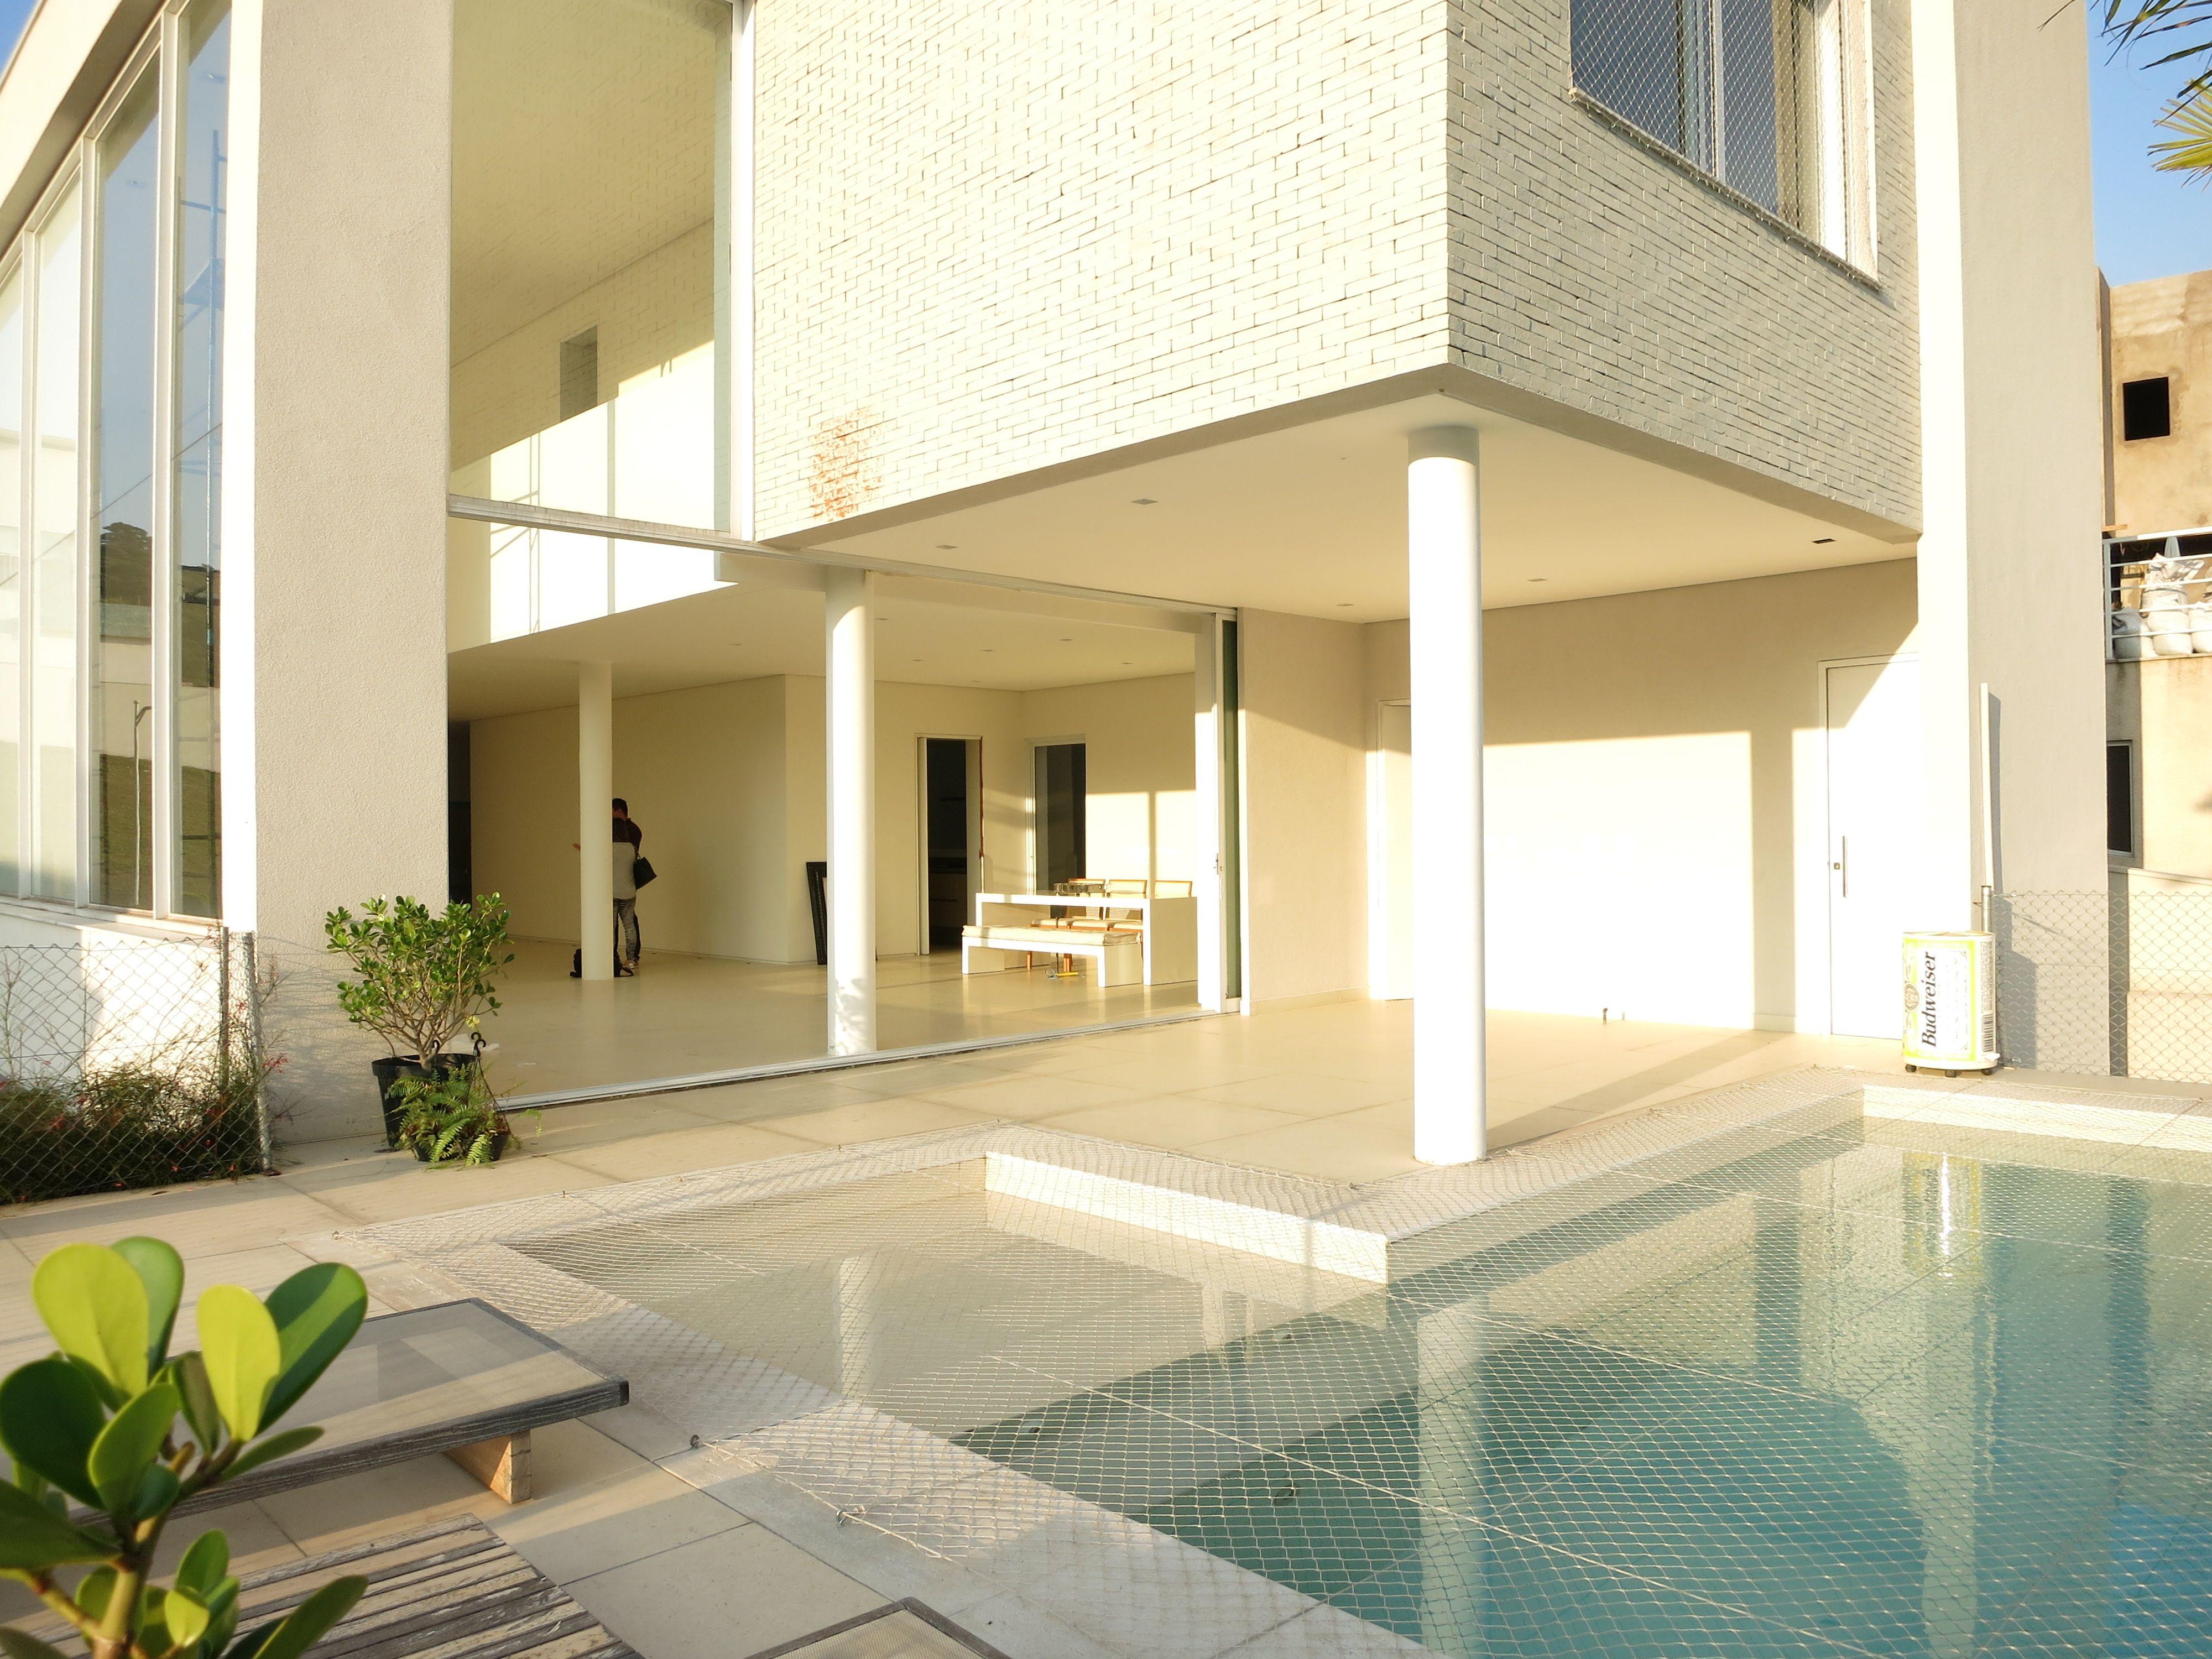 Architecture project by Roberto Migotto and Paisagism by Renata Tilli. 660sqm 5 en suite bedrooms 4 parking spaces Price: R$2.700.000 Infos&Visits: contato@agulhanoceleiro.com.br